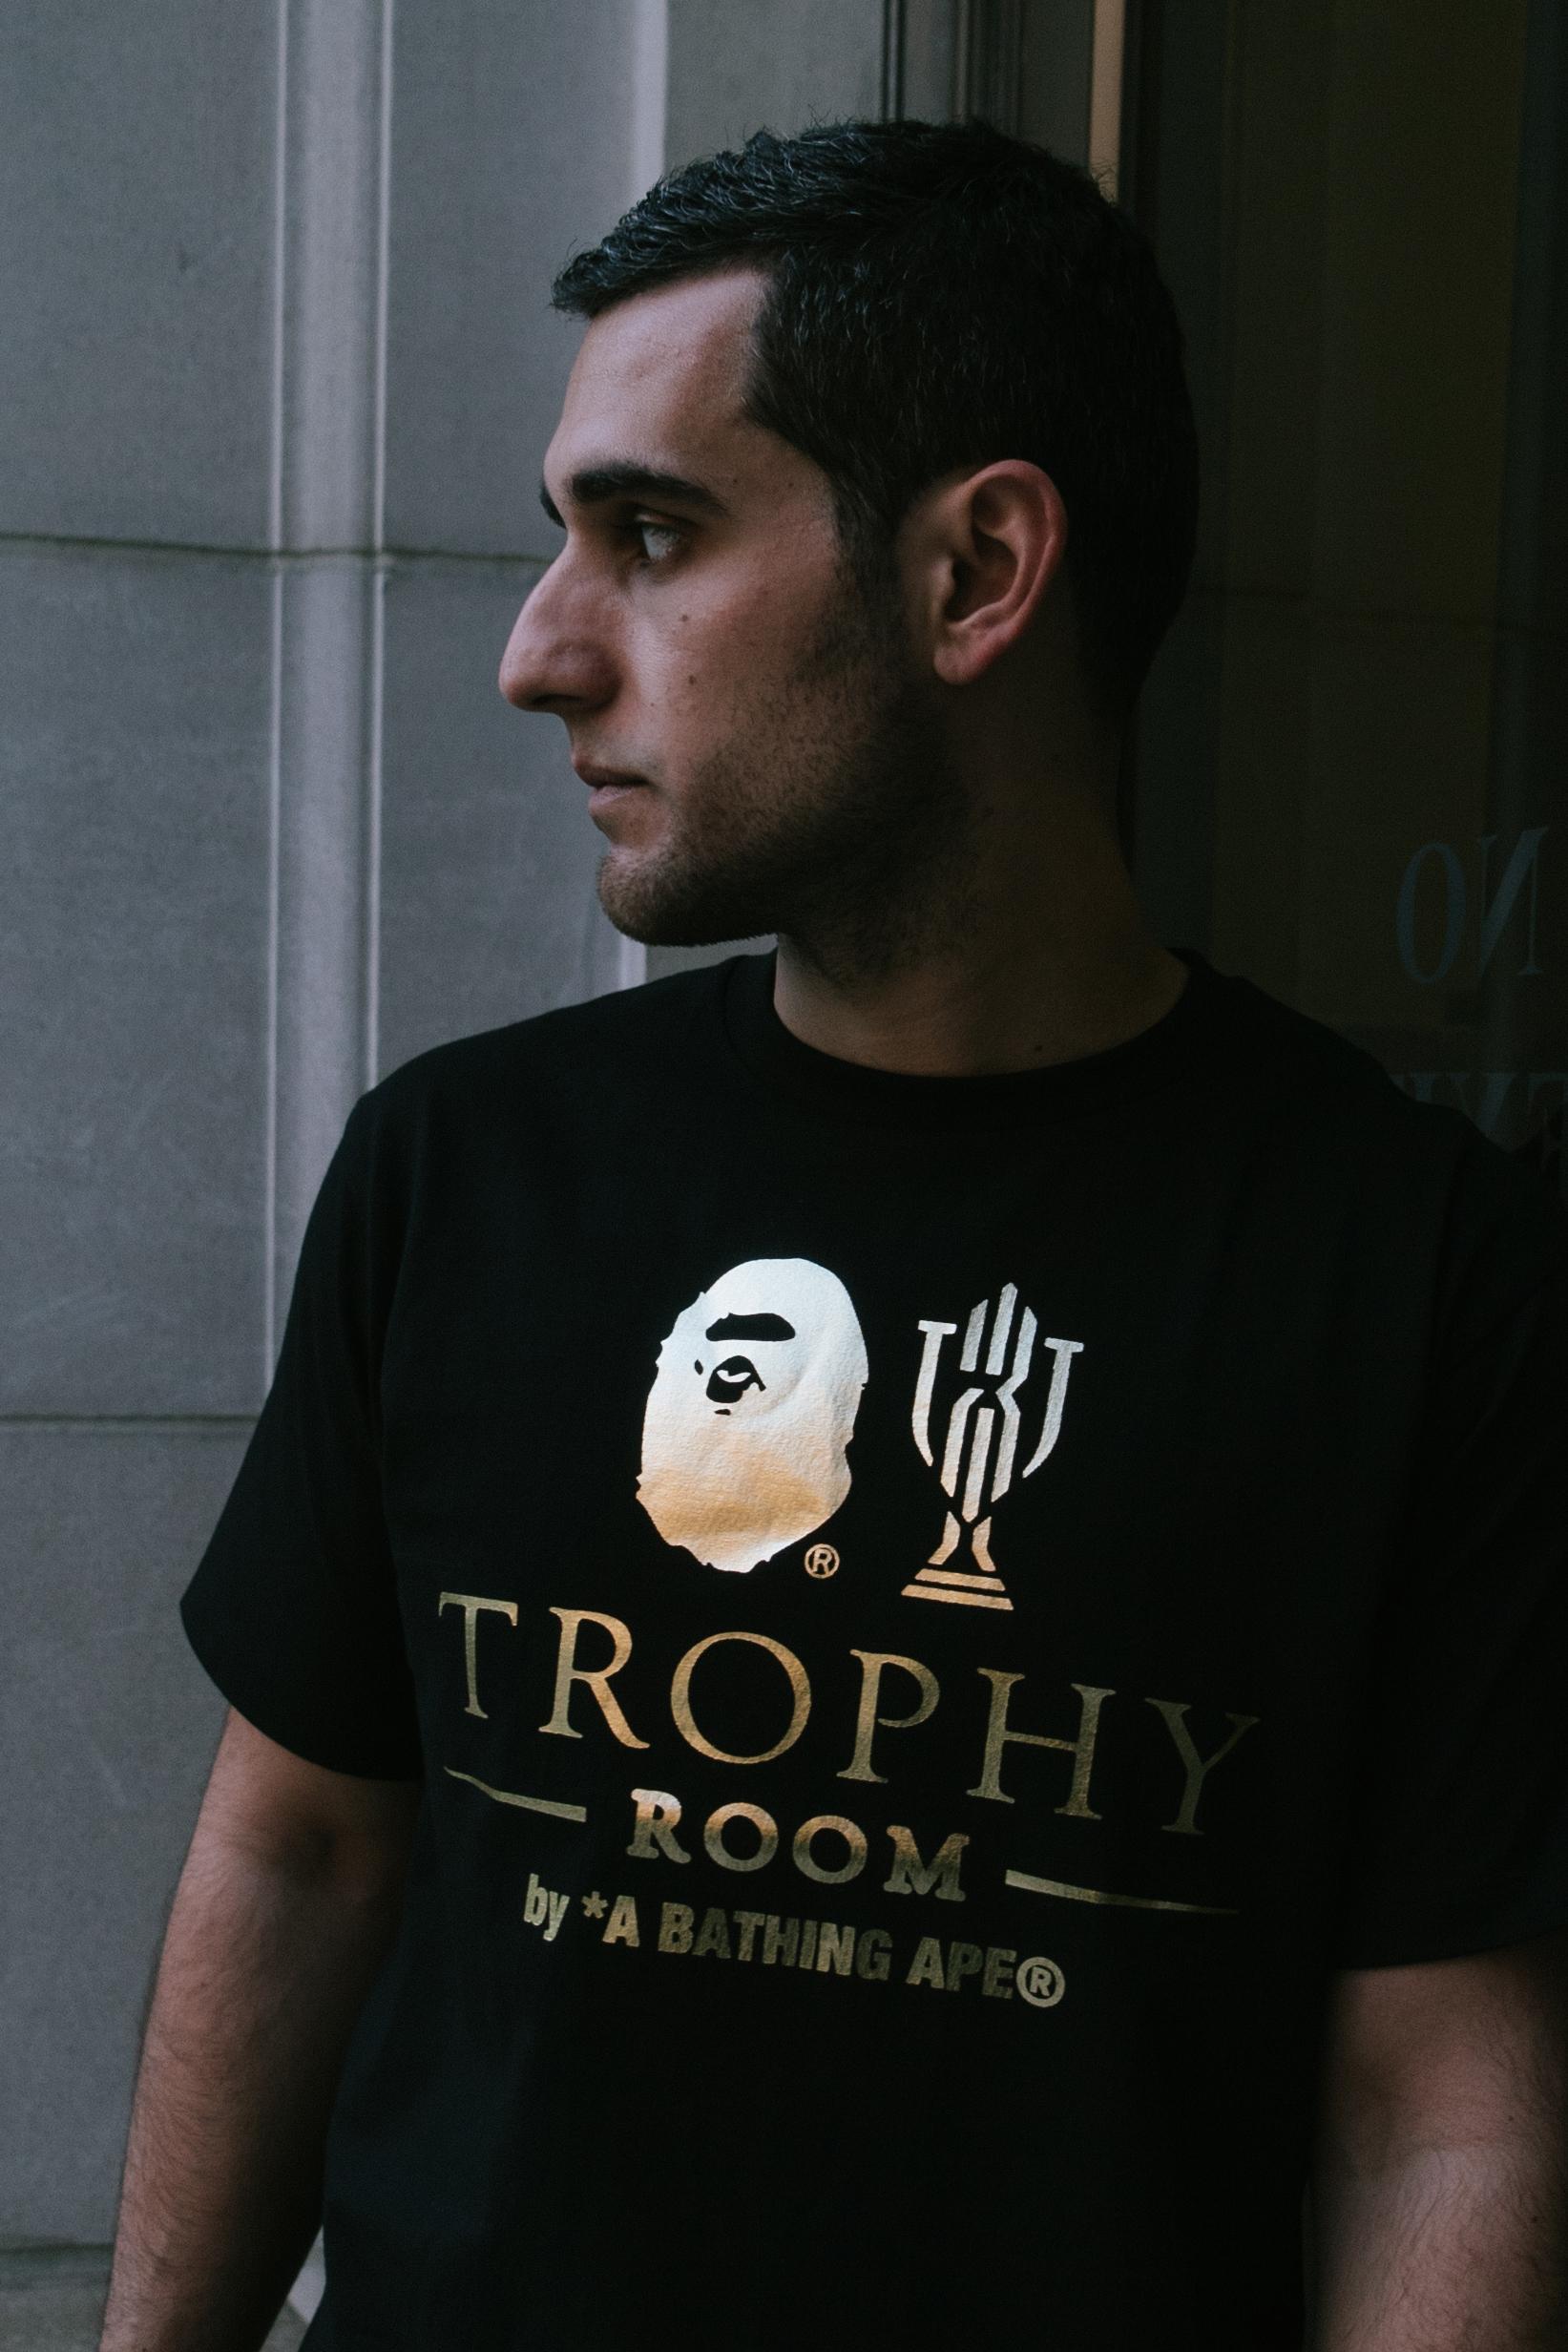 Trophy Room x BAPE Lookbook and Release Information - 3759798